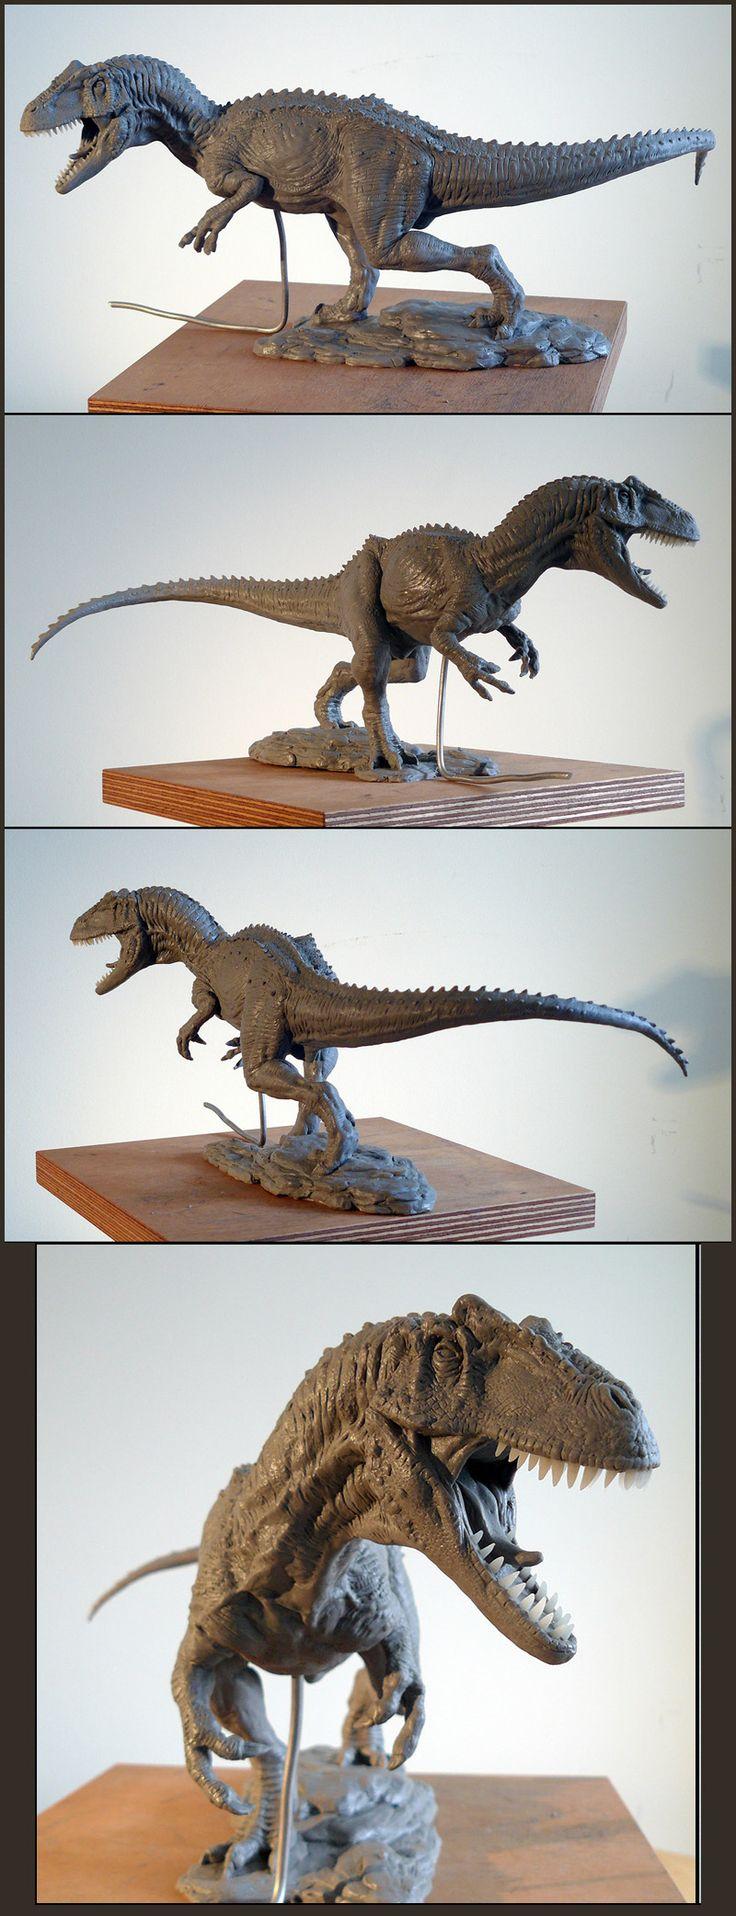 Escultura de alossauro